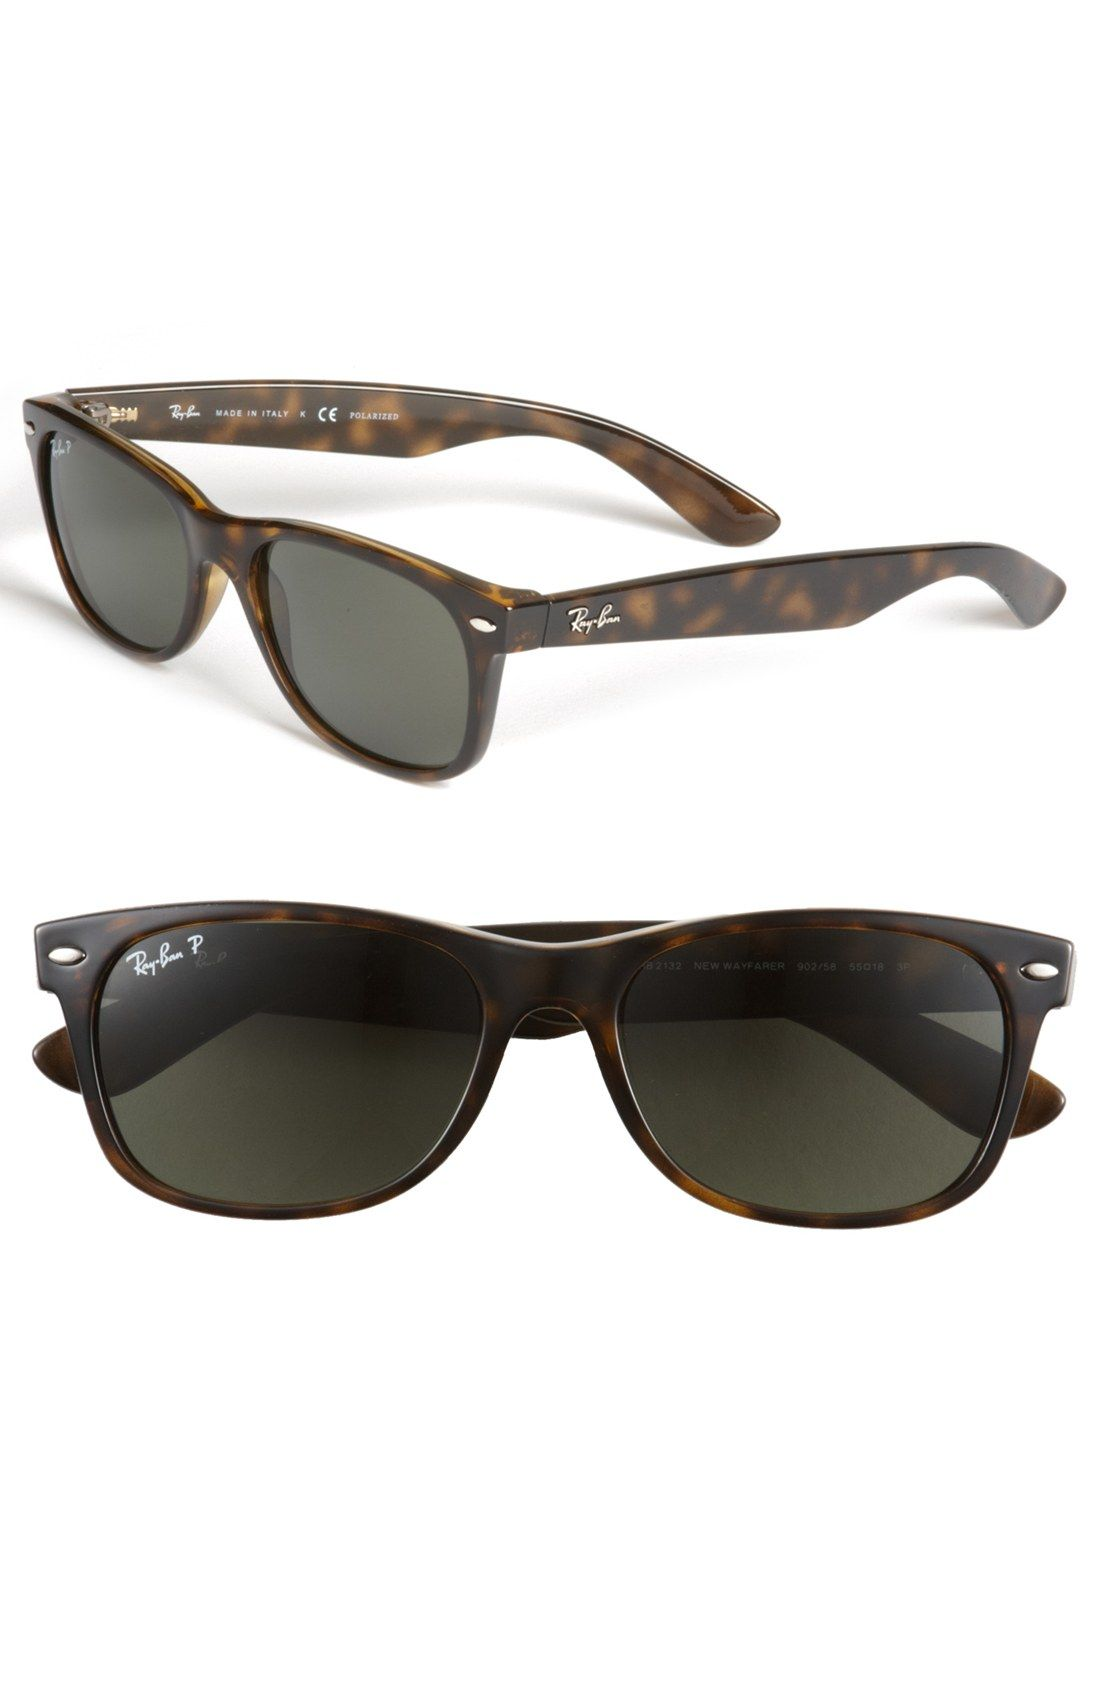 Ray Ban 'New Wayfarer' 55mm Polarized Sunglasses